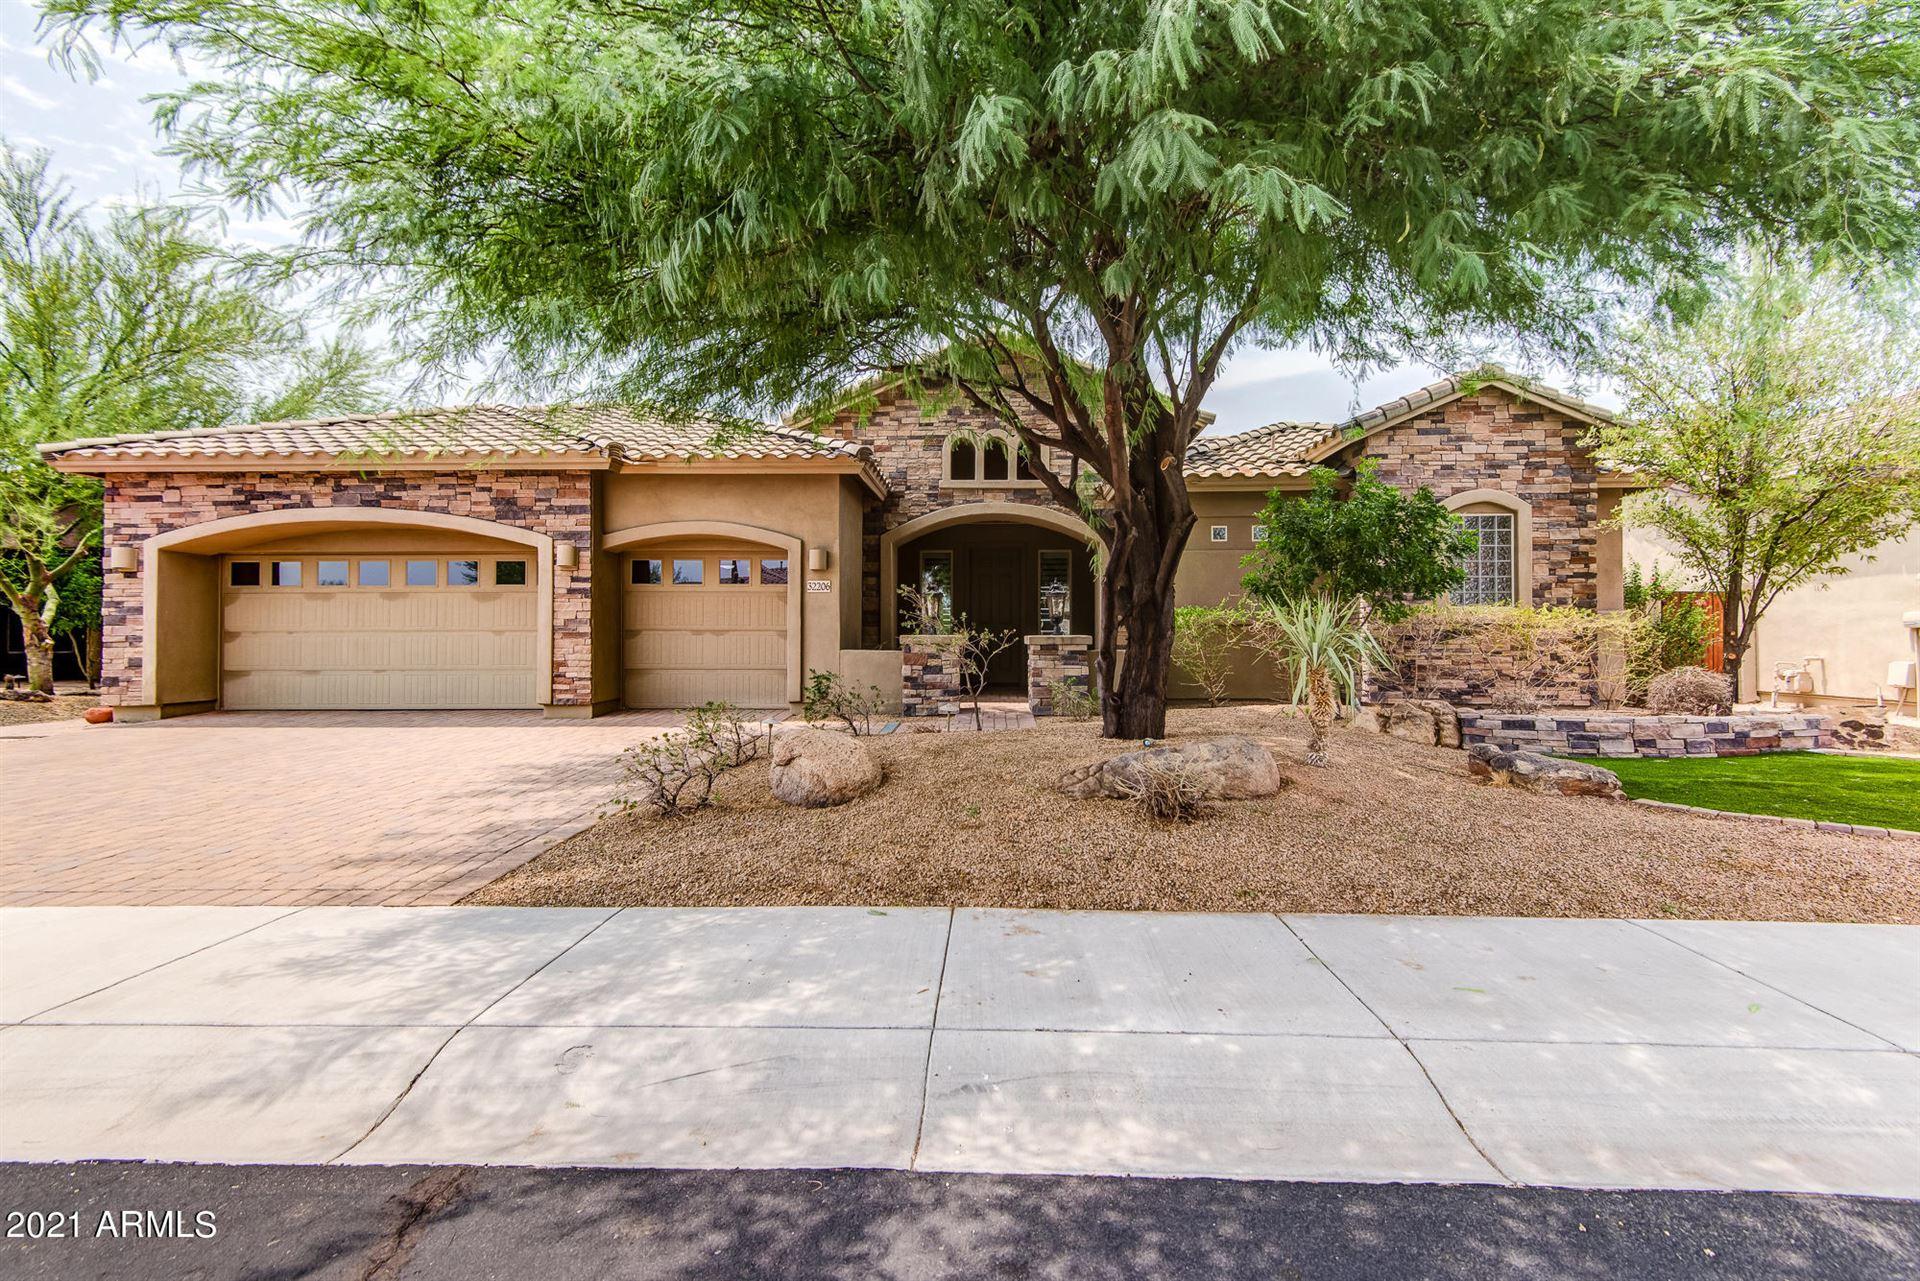 Photo of 32206 N 56TH Place, Cave Creek, AZ 85331 (MLS # 6269354)